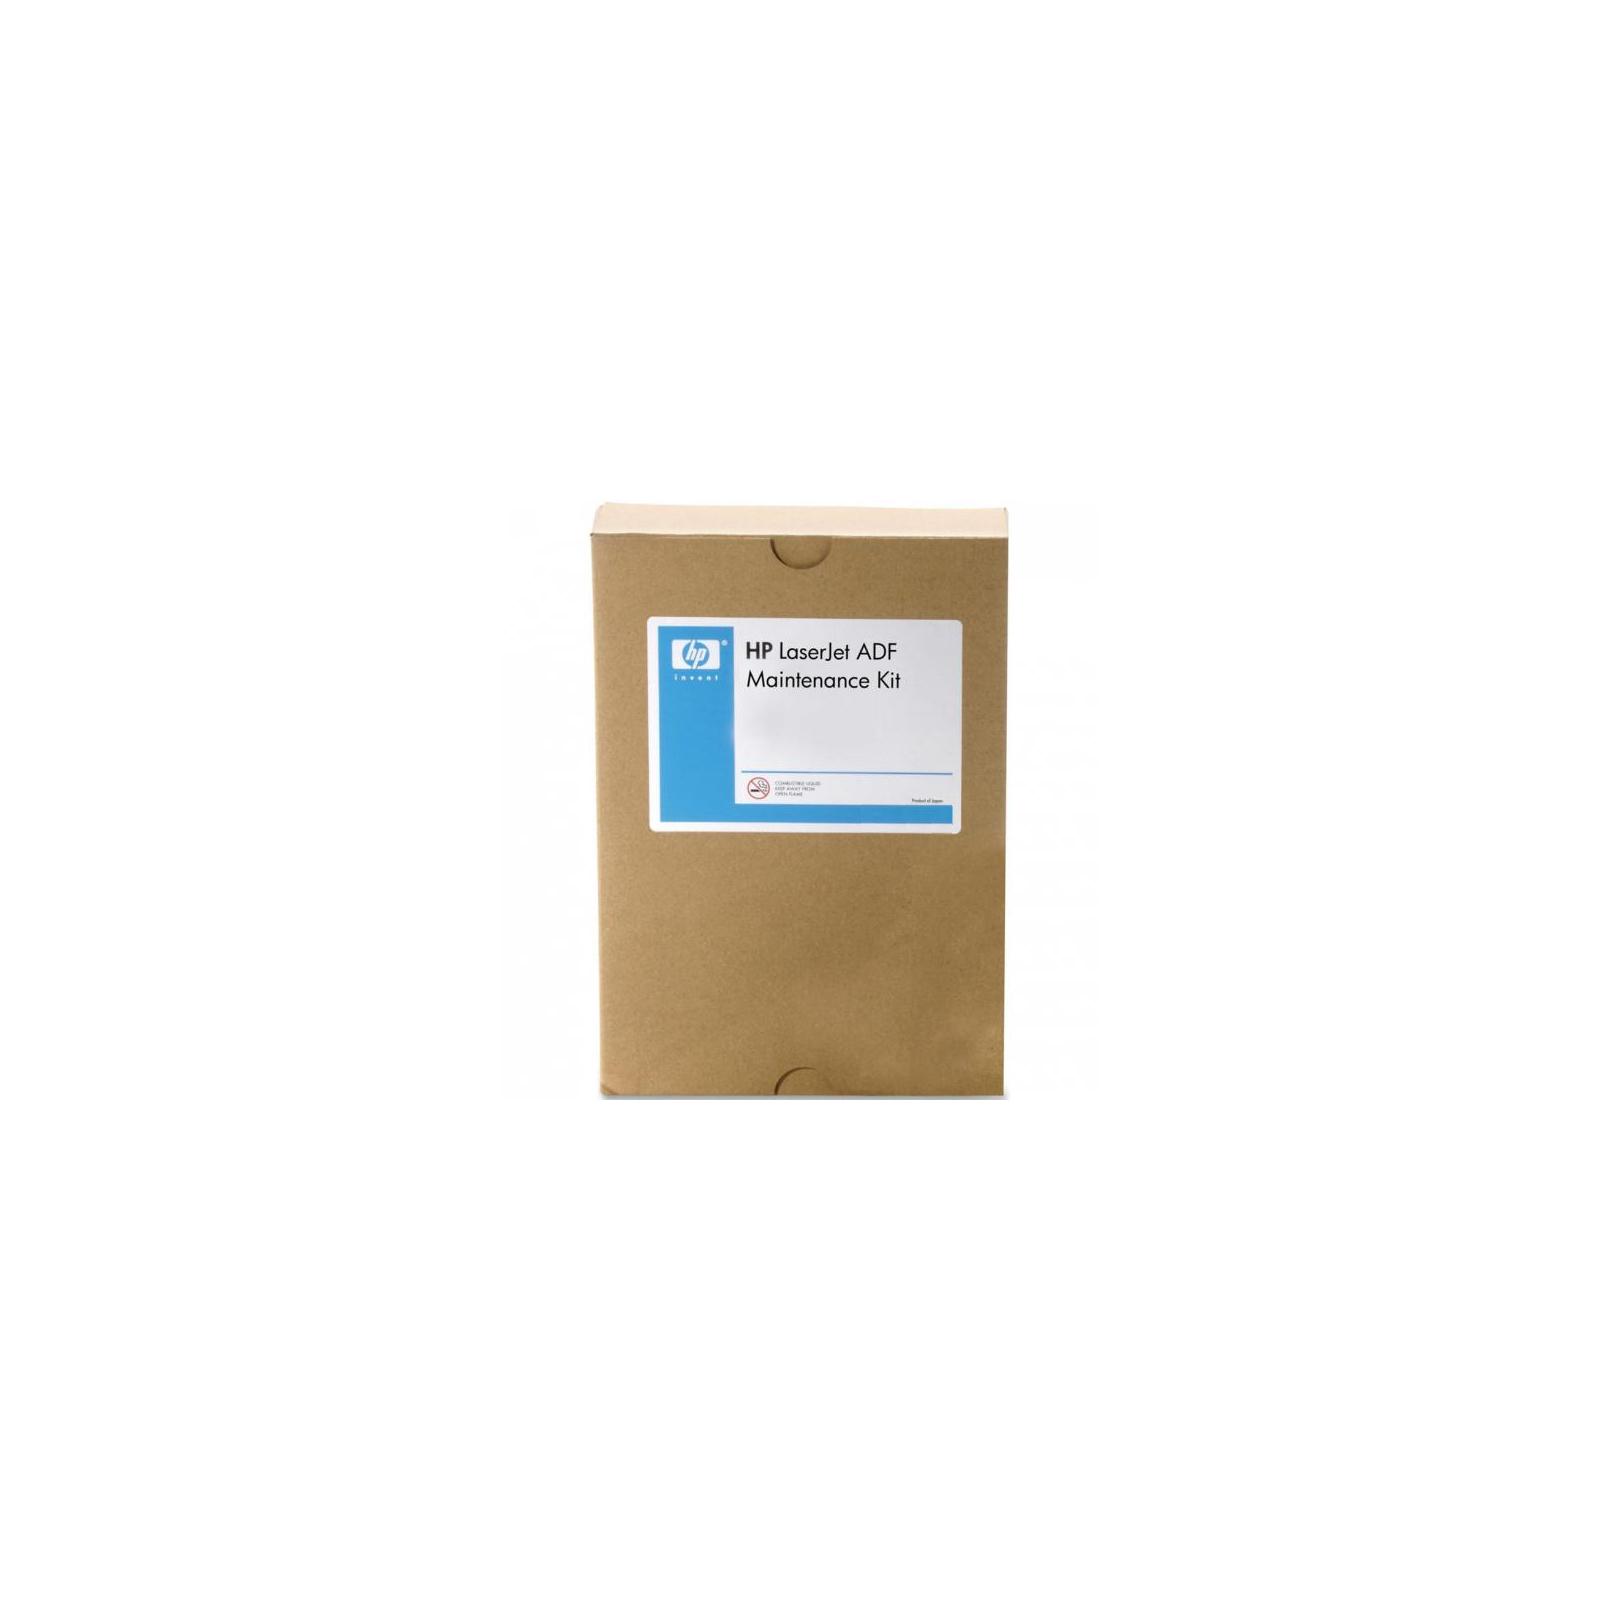 Ремкомплект HP ADF Maintenance Kit LJ M5025/M5035 (Q7842A)